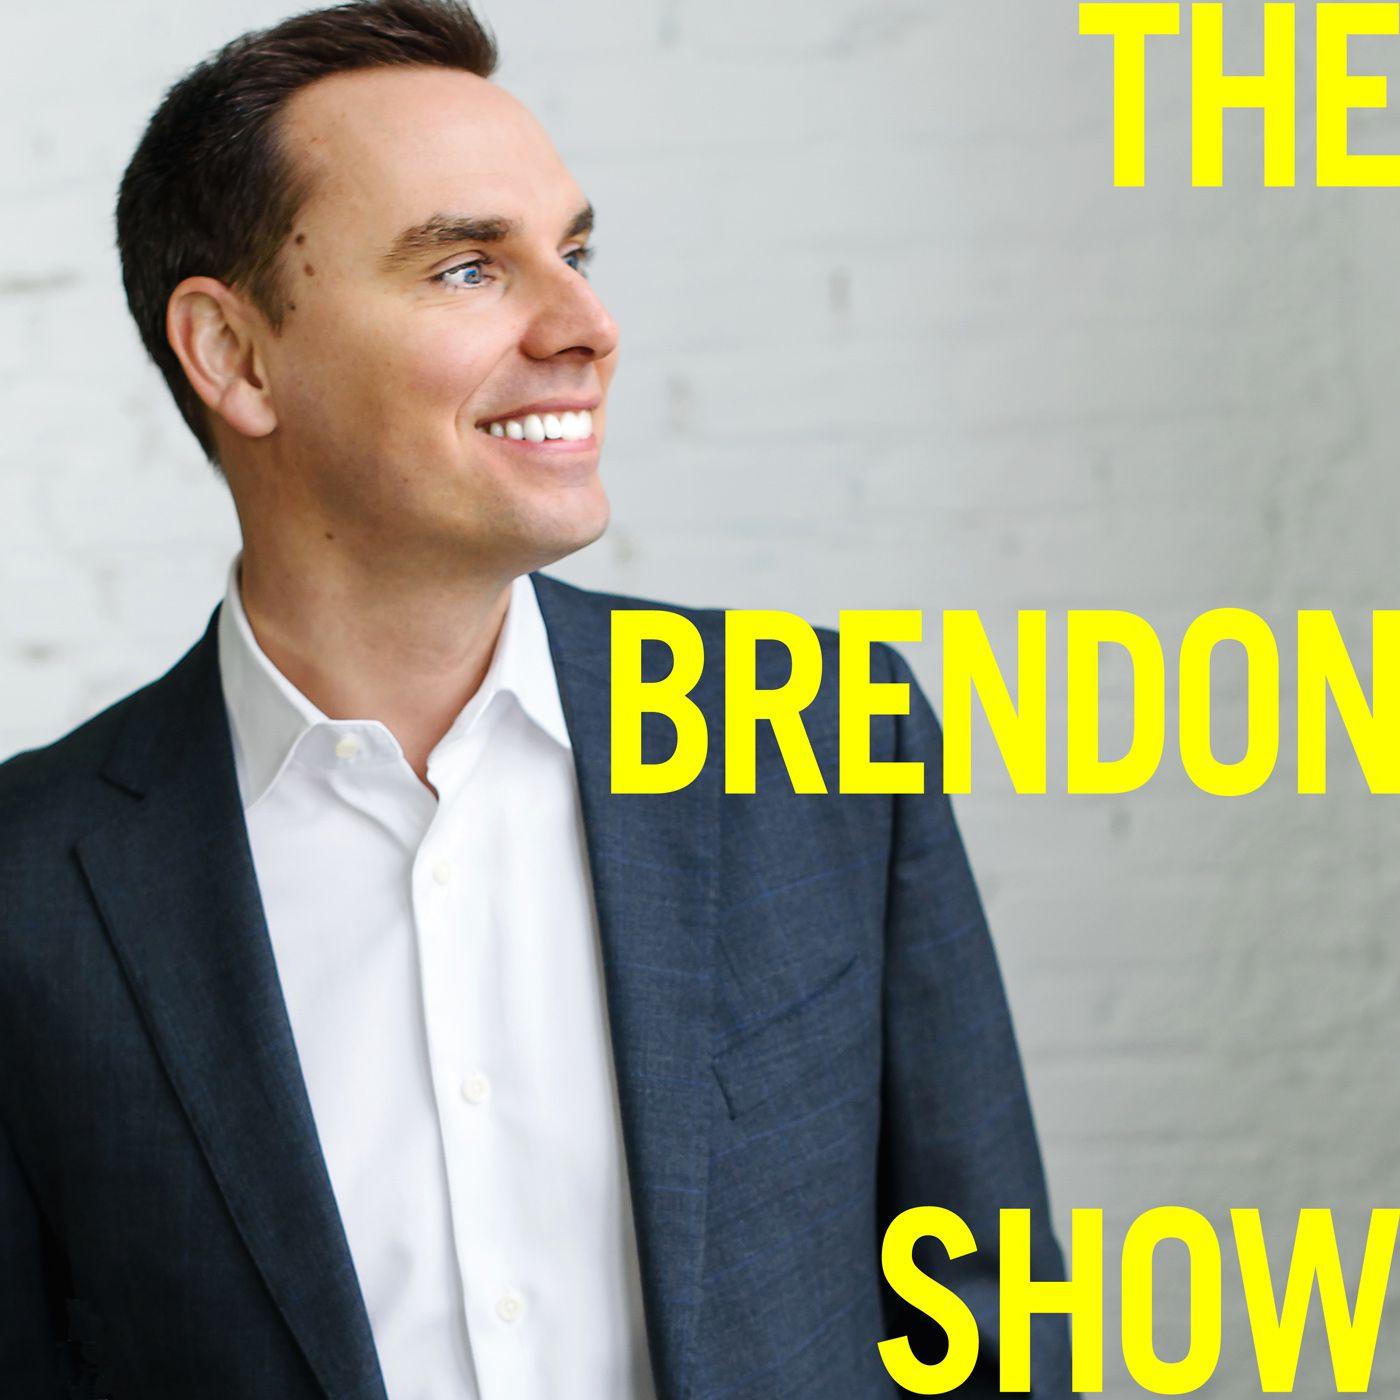 Brendon show